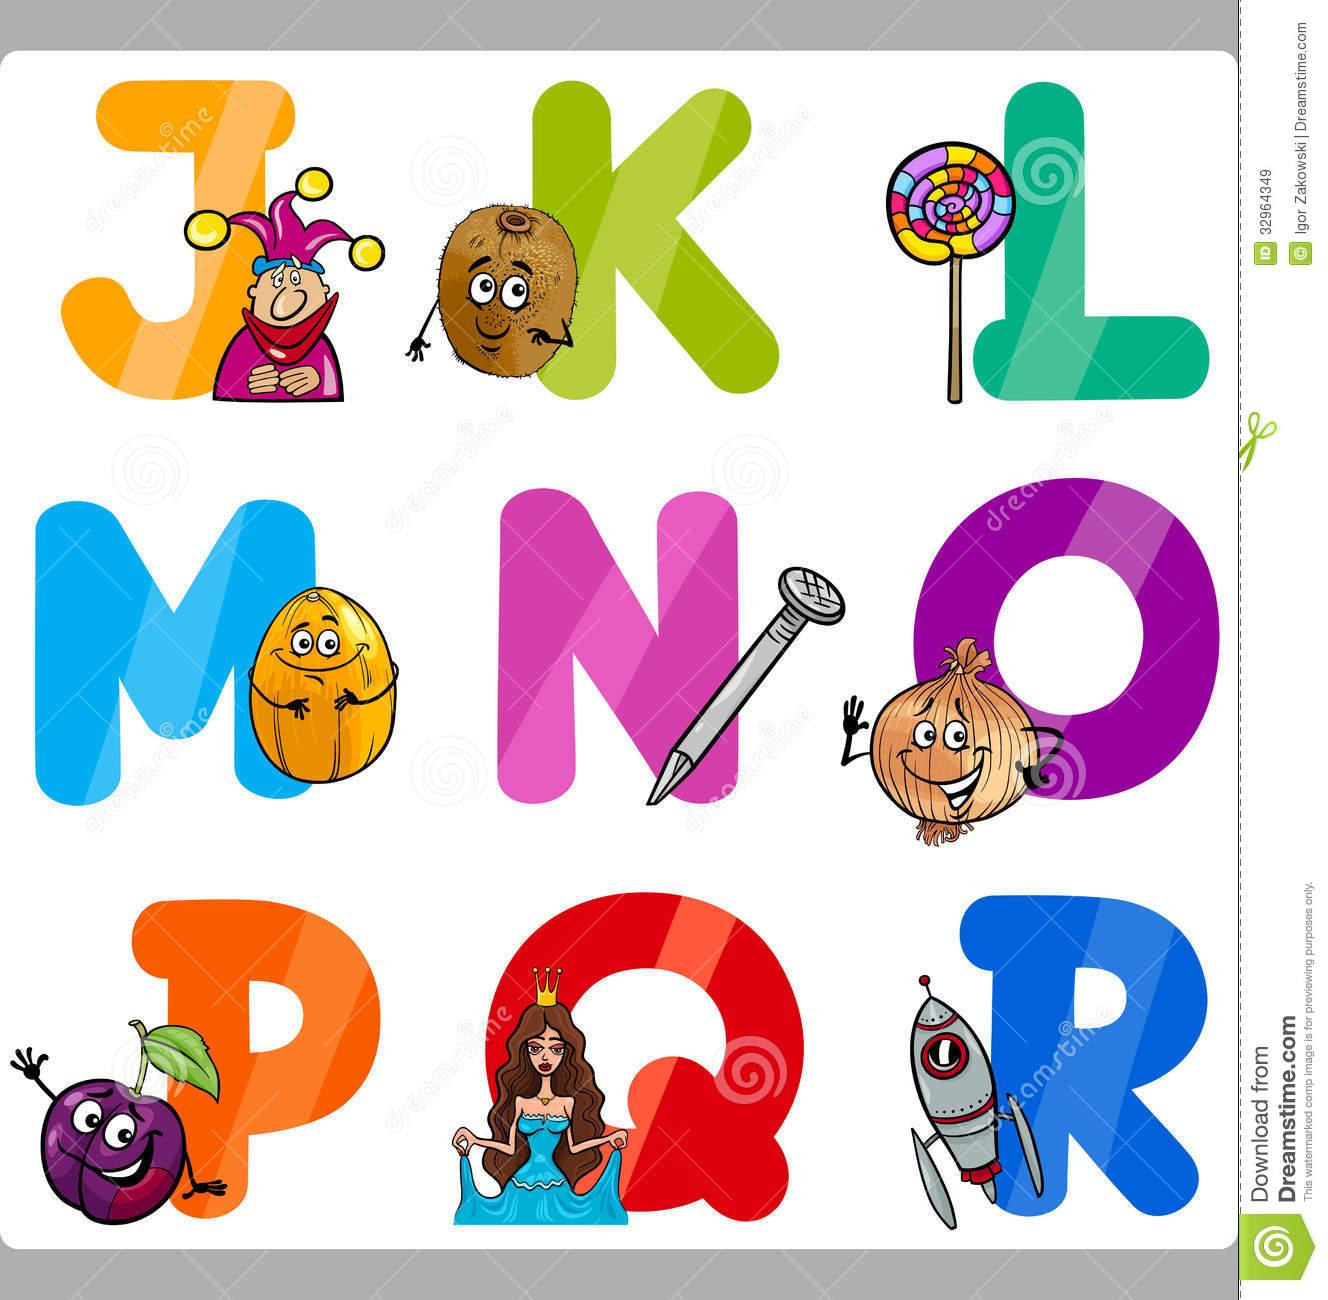 Letters for kids clipart clip art transparent library Education Cartoon Alphabet Letters For Kids Royalty Free Stock ... clip art transparent library